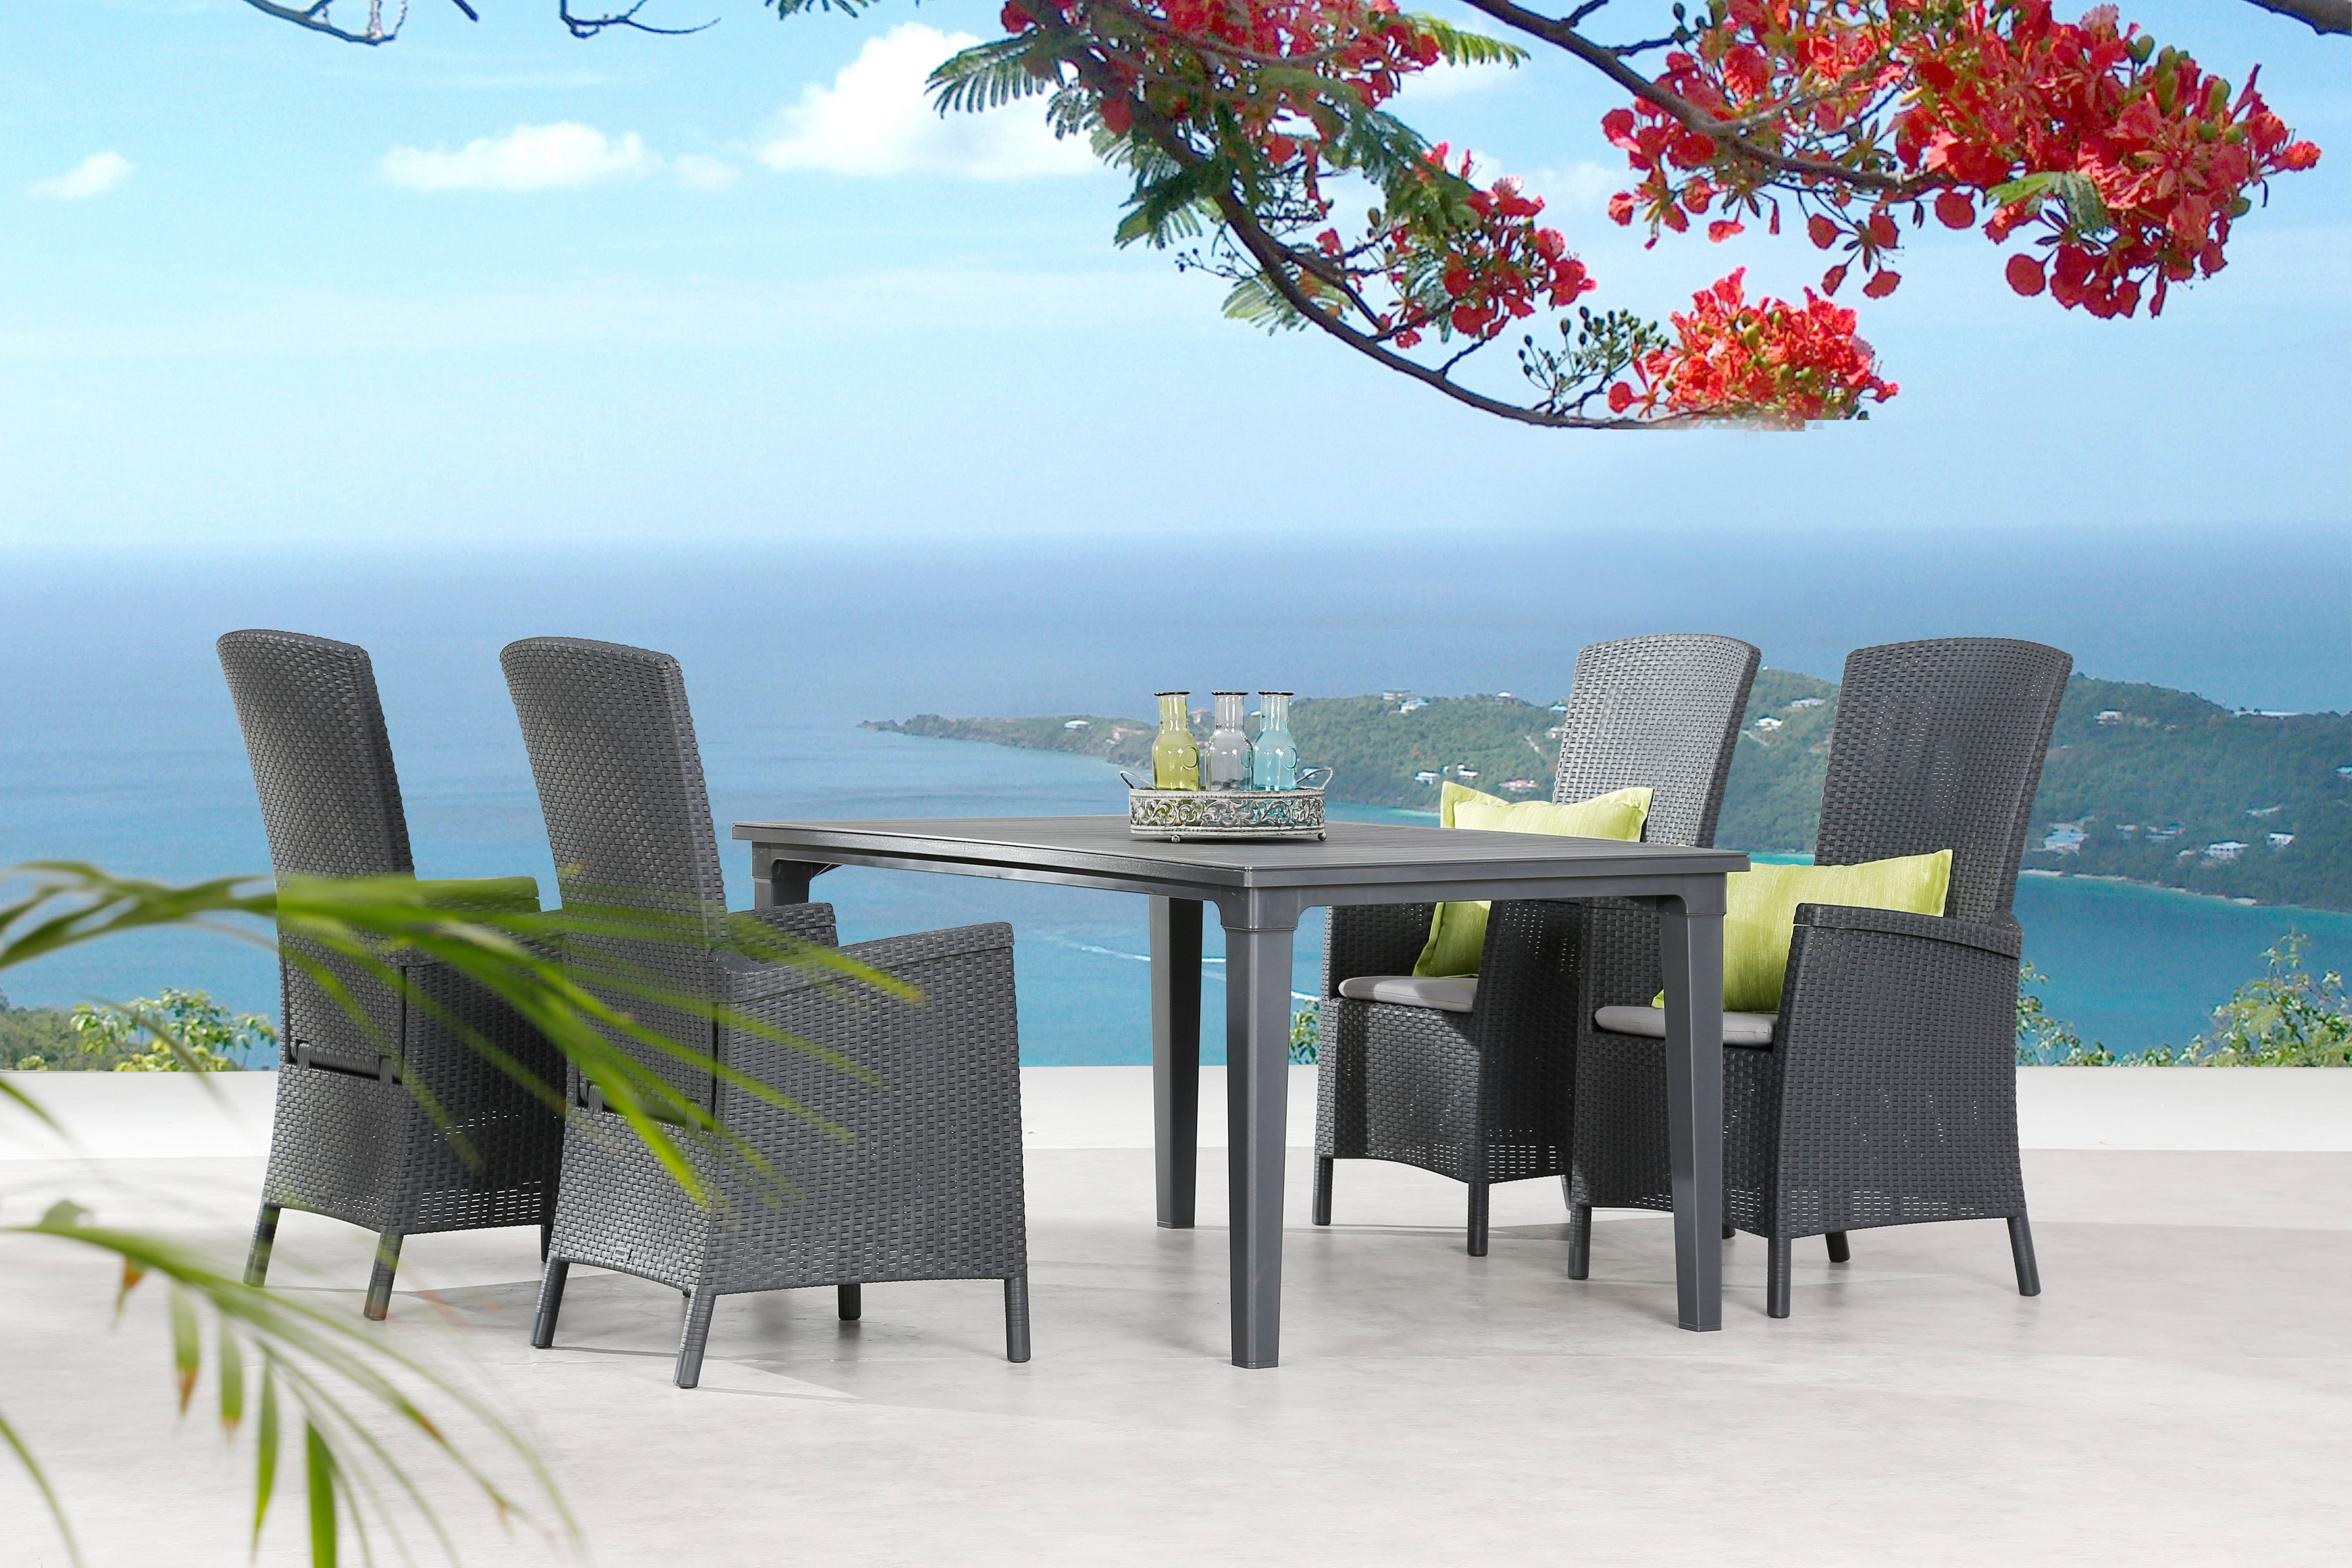 BEST Gartenmöbelset Capri 5-tlg 4 Sessel Tisch 165x94 cm inkl Sitzkissen